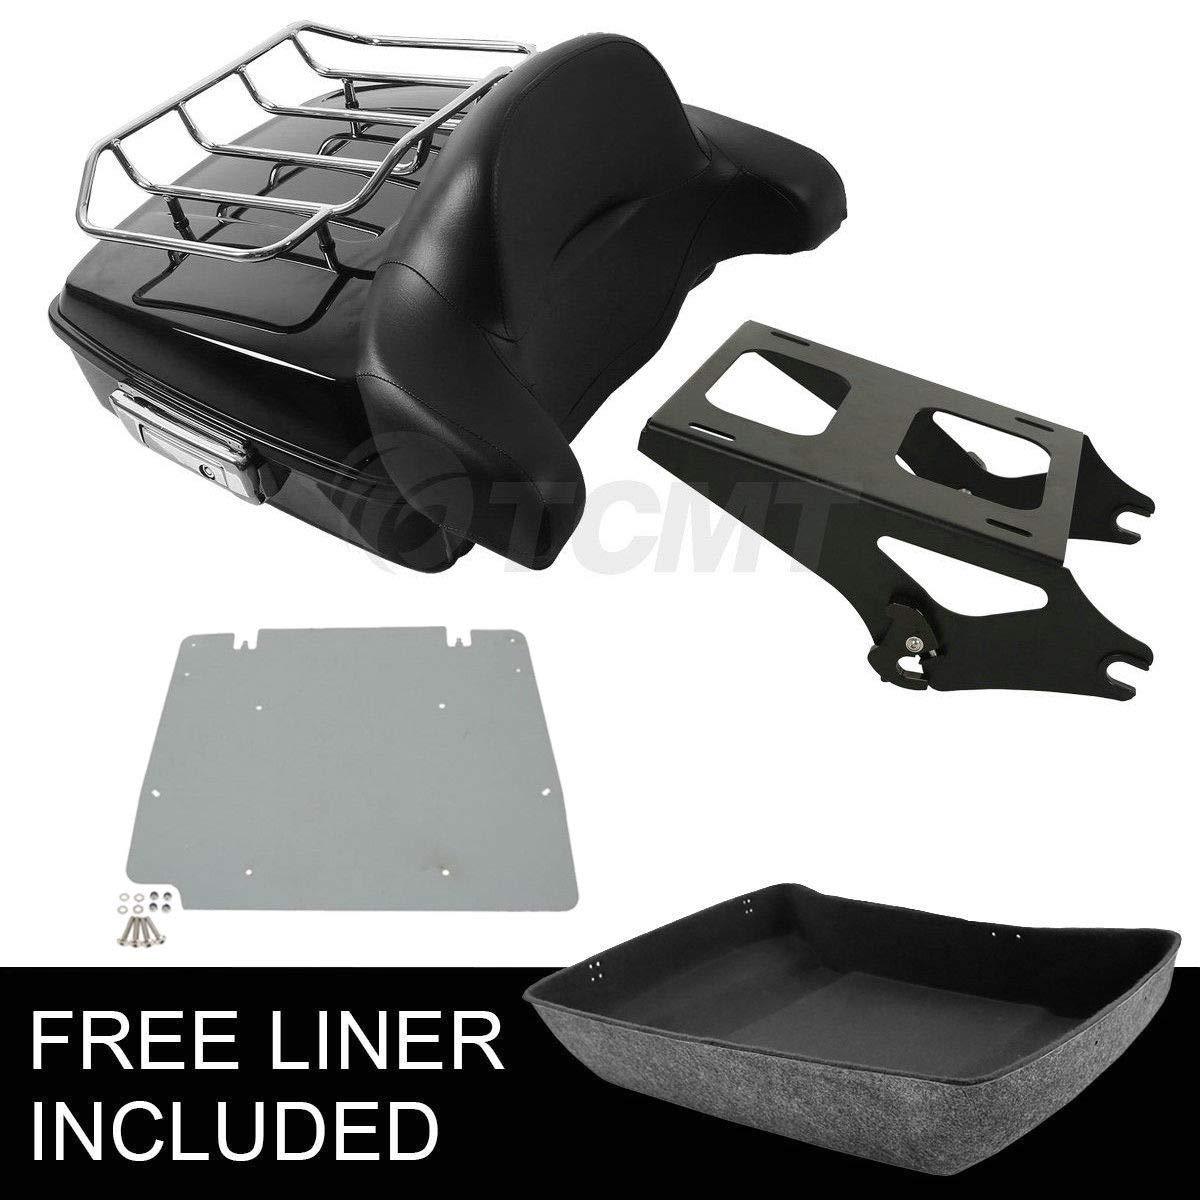 TCMT Tour Pack Trunk Backrest+Luggage Rack Fits For Harley Touring FLHR FLHT FLHX 2014-2020(Style J Black) by TCMT